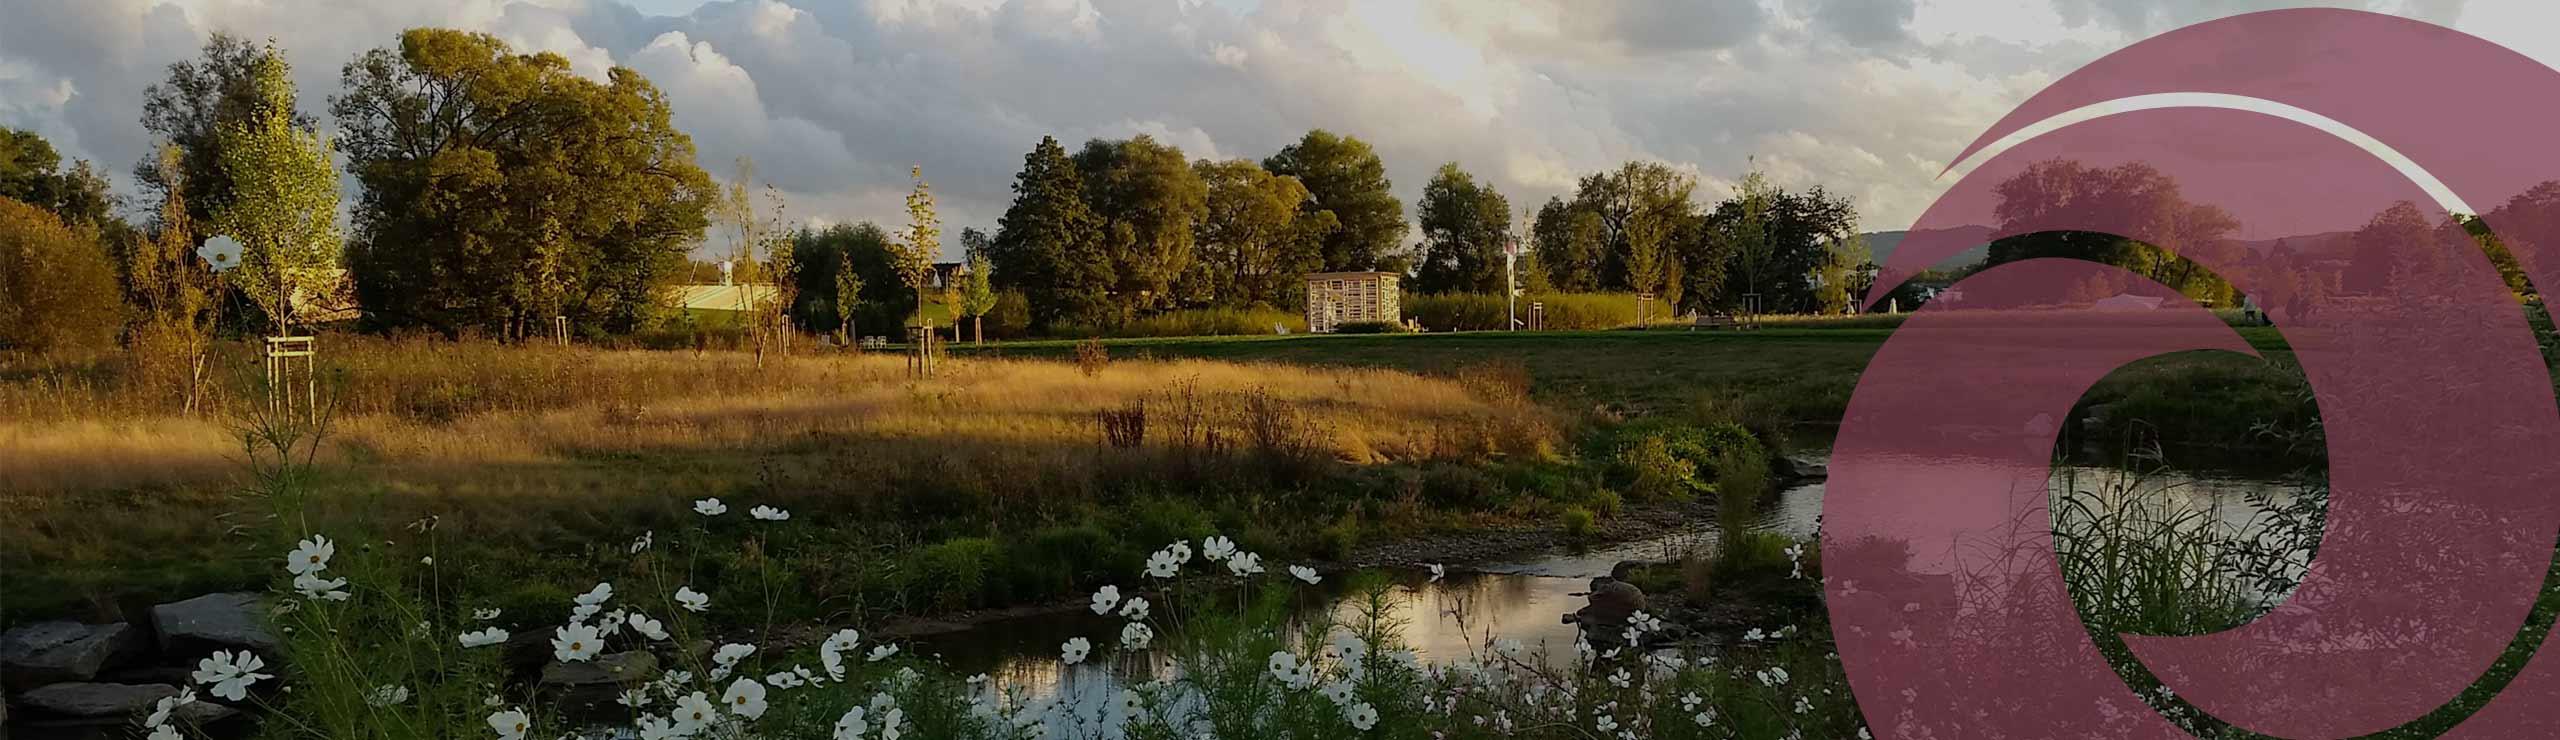 Aktuelles |Hospizverein Bayreuth e.V.